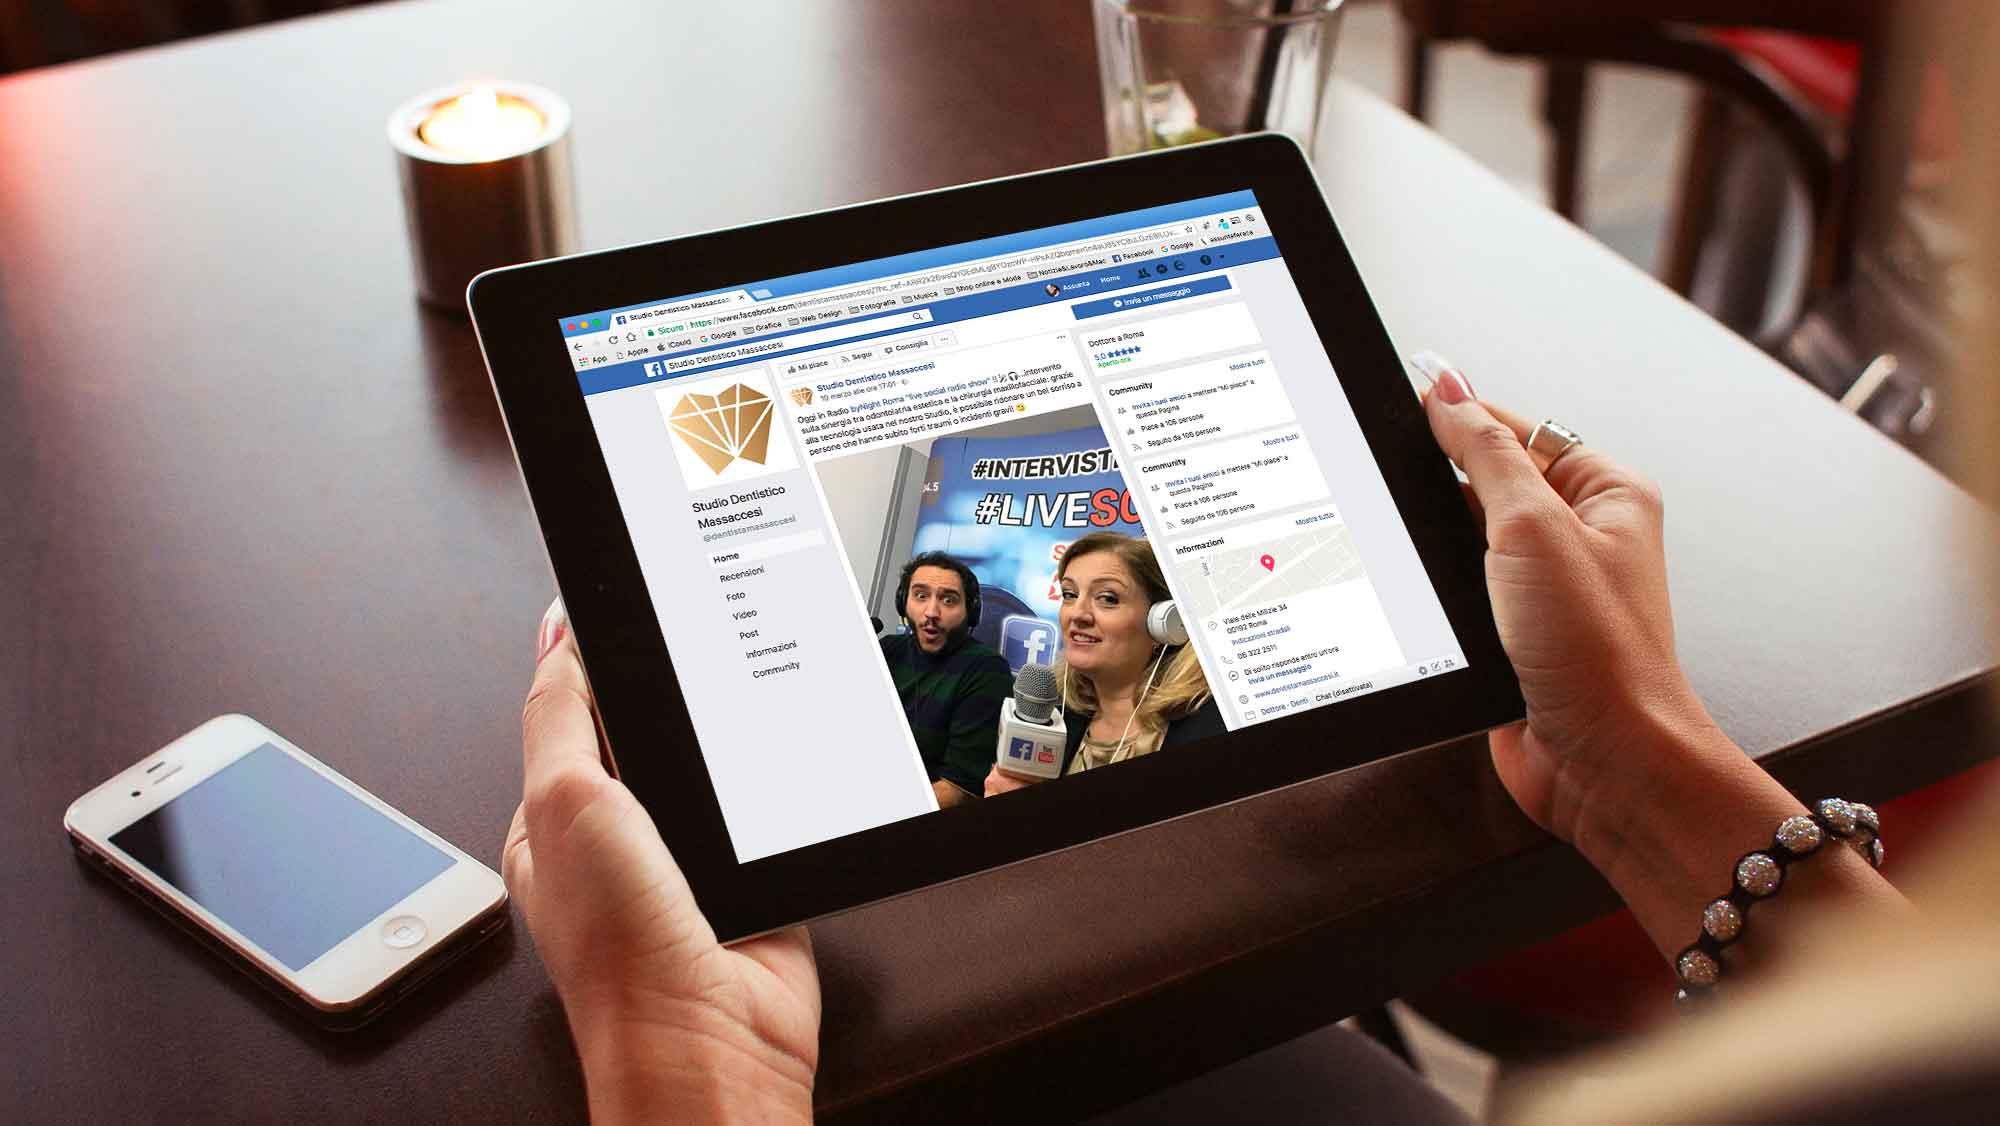 gestione-professionale-pagine-social-facebook